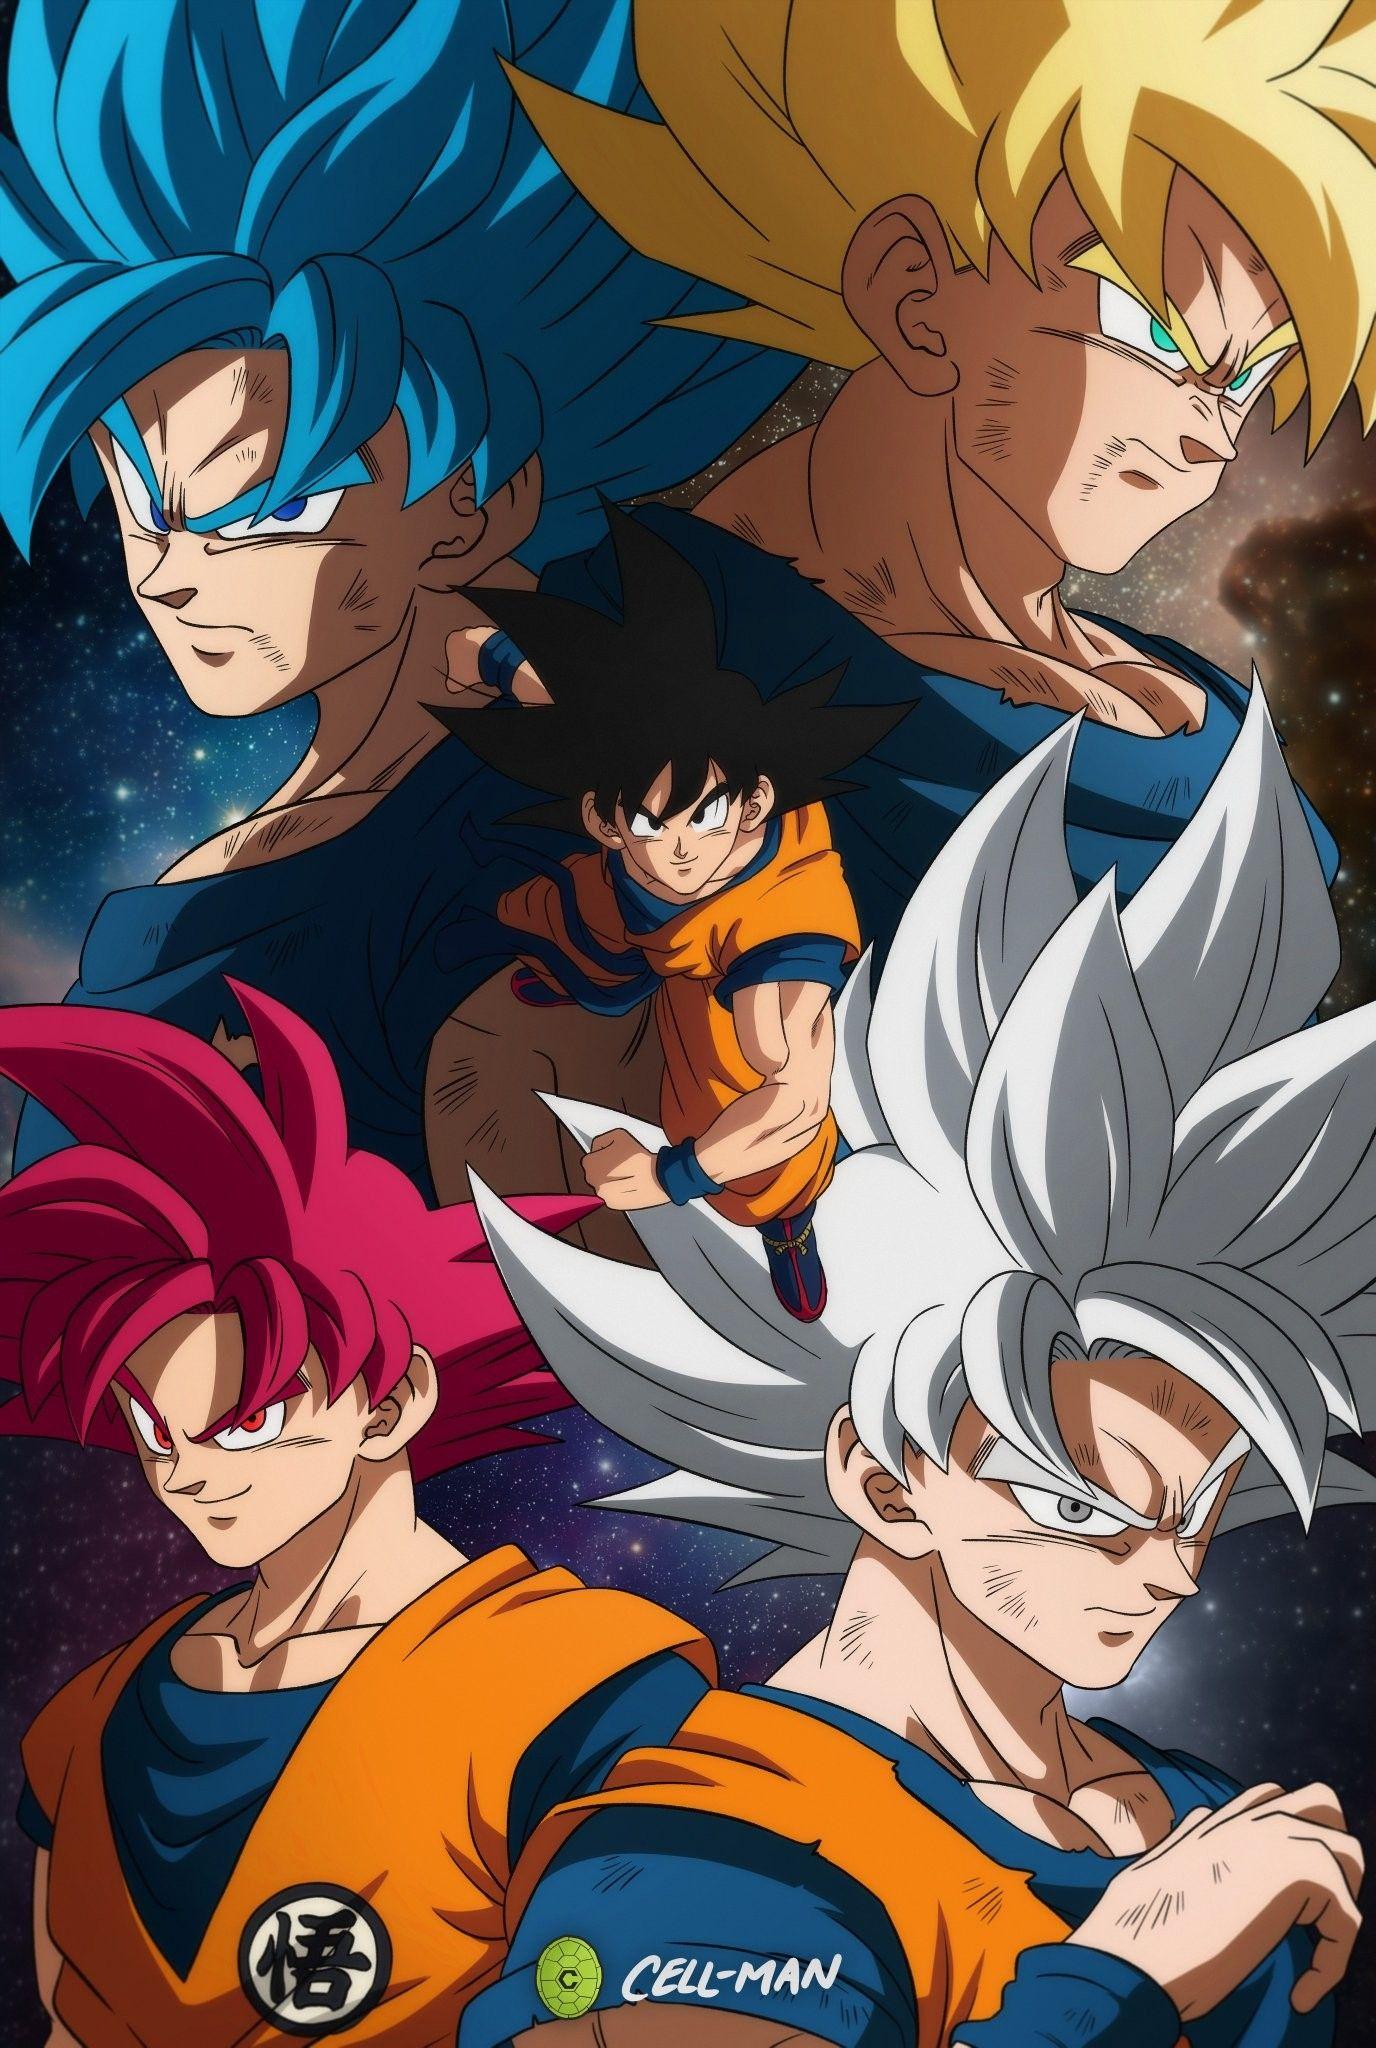 Pin By Travis Shadowsaiyan On Dragon Ball Super Anime Dragon Ball Super Dragon Ball Goku Dragon Ball Art